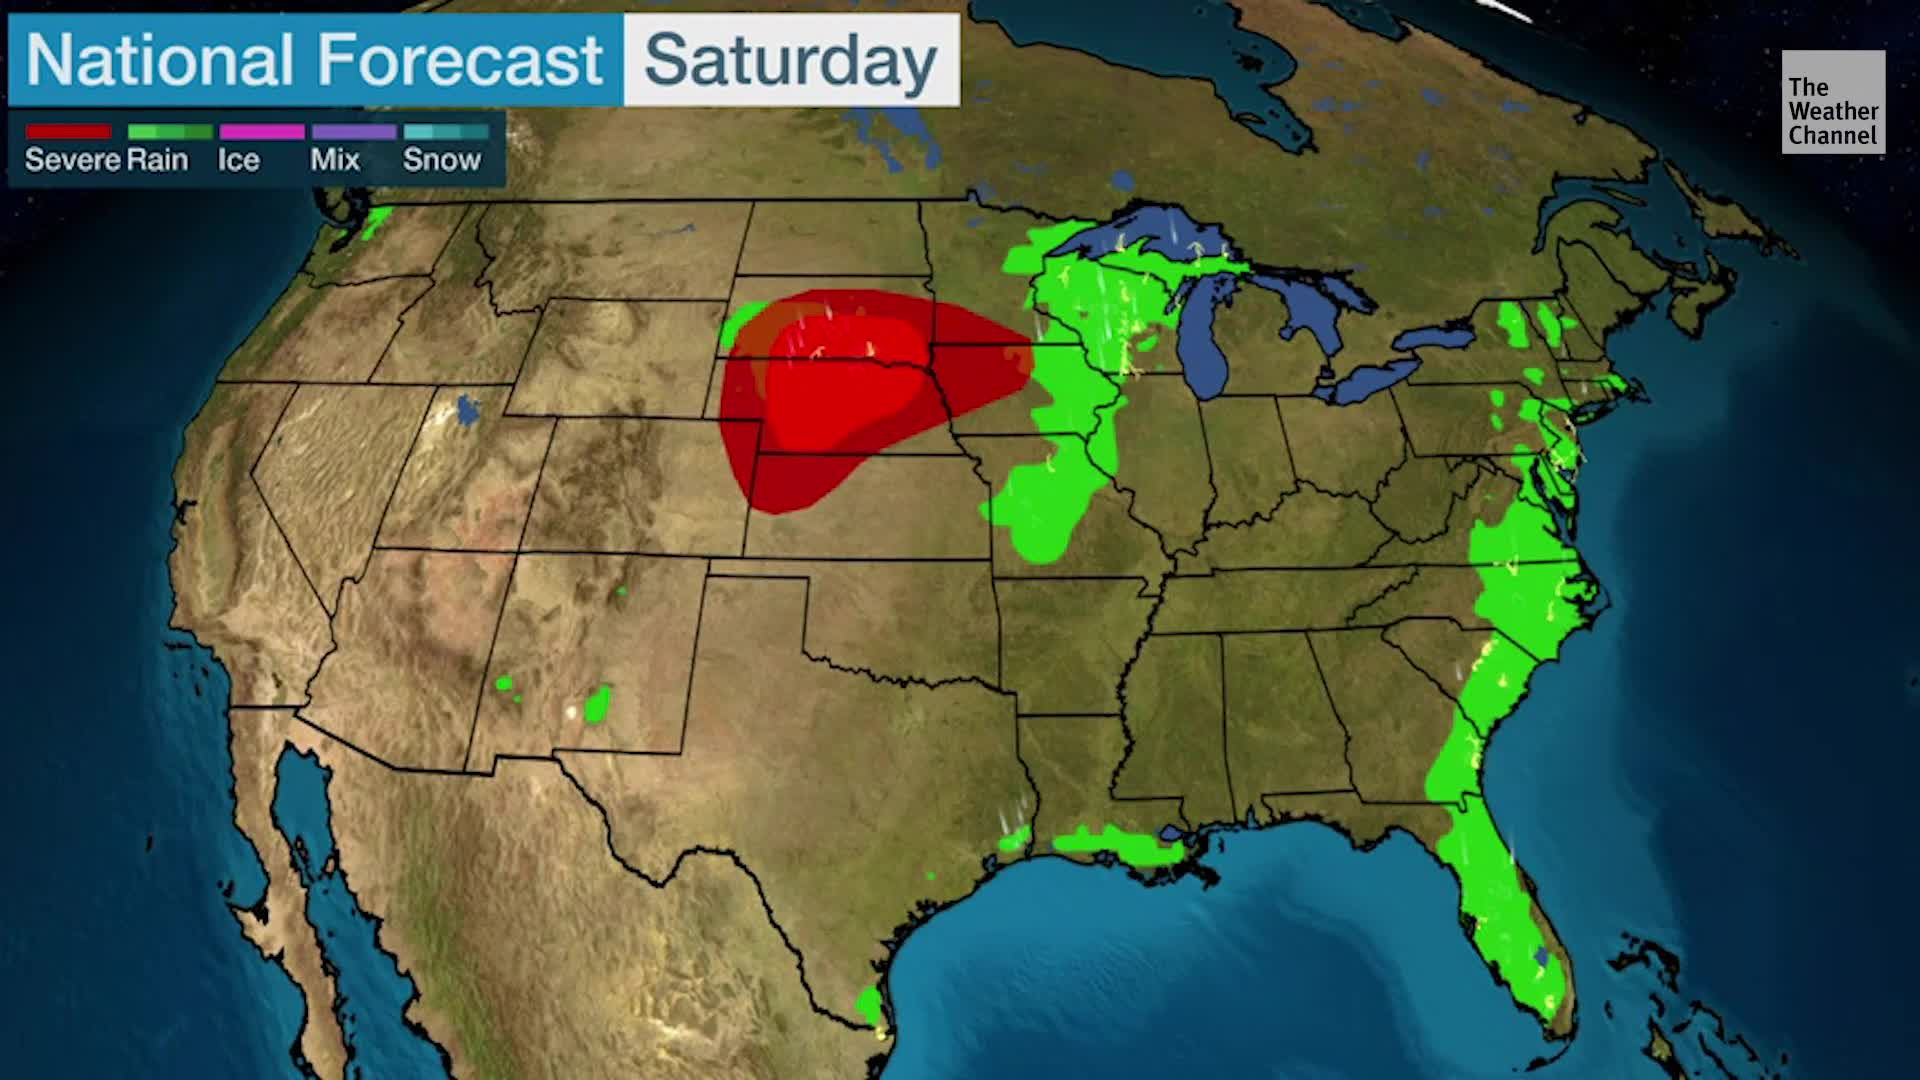 National Weekend Forecast